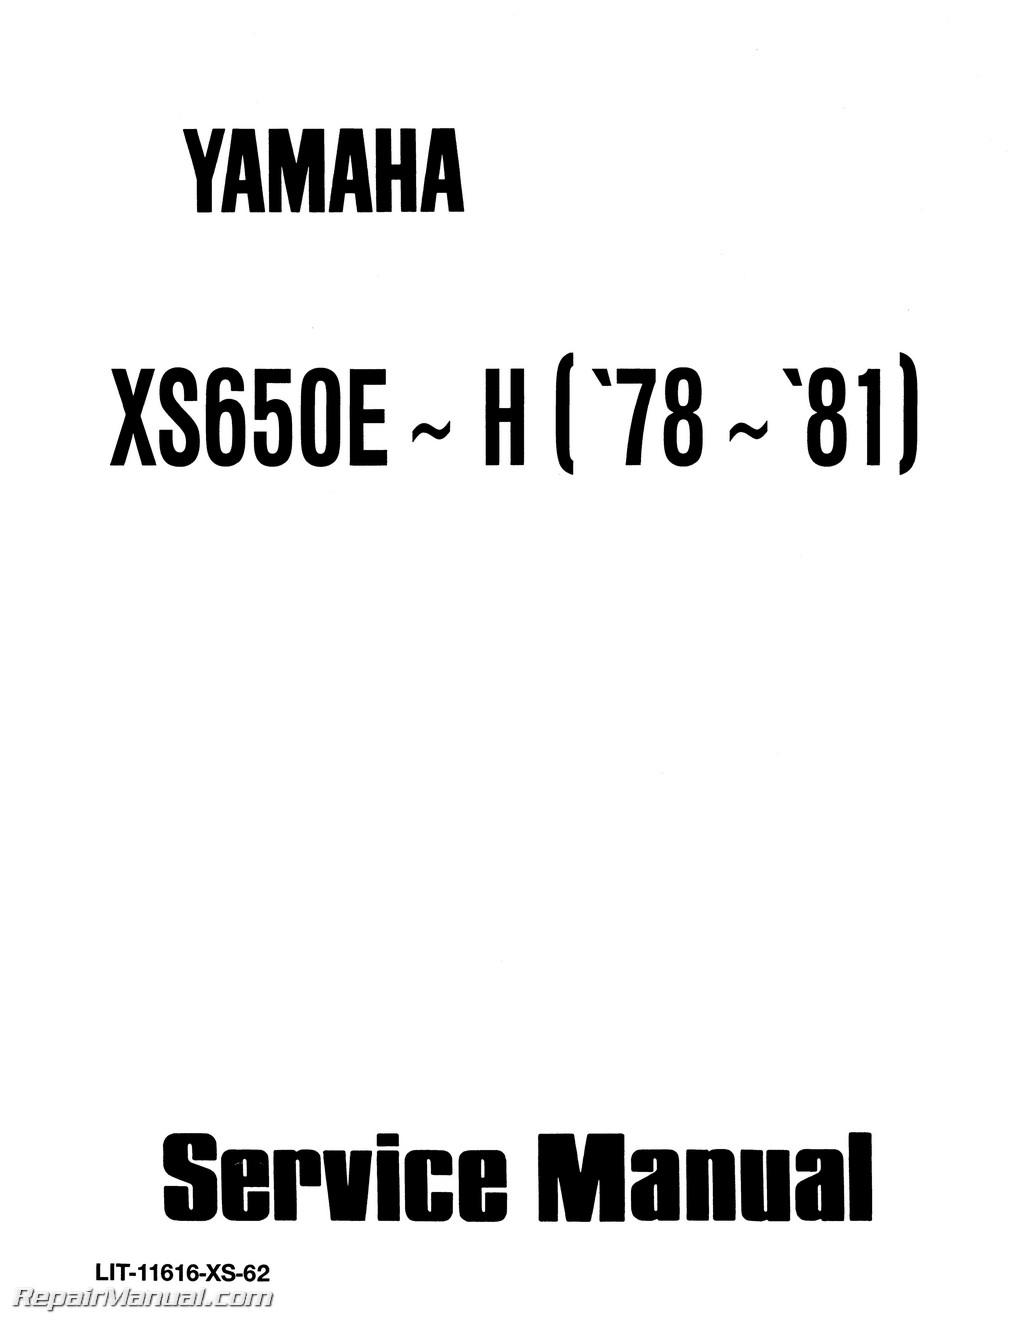 Yamaha Motorcycle Repair